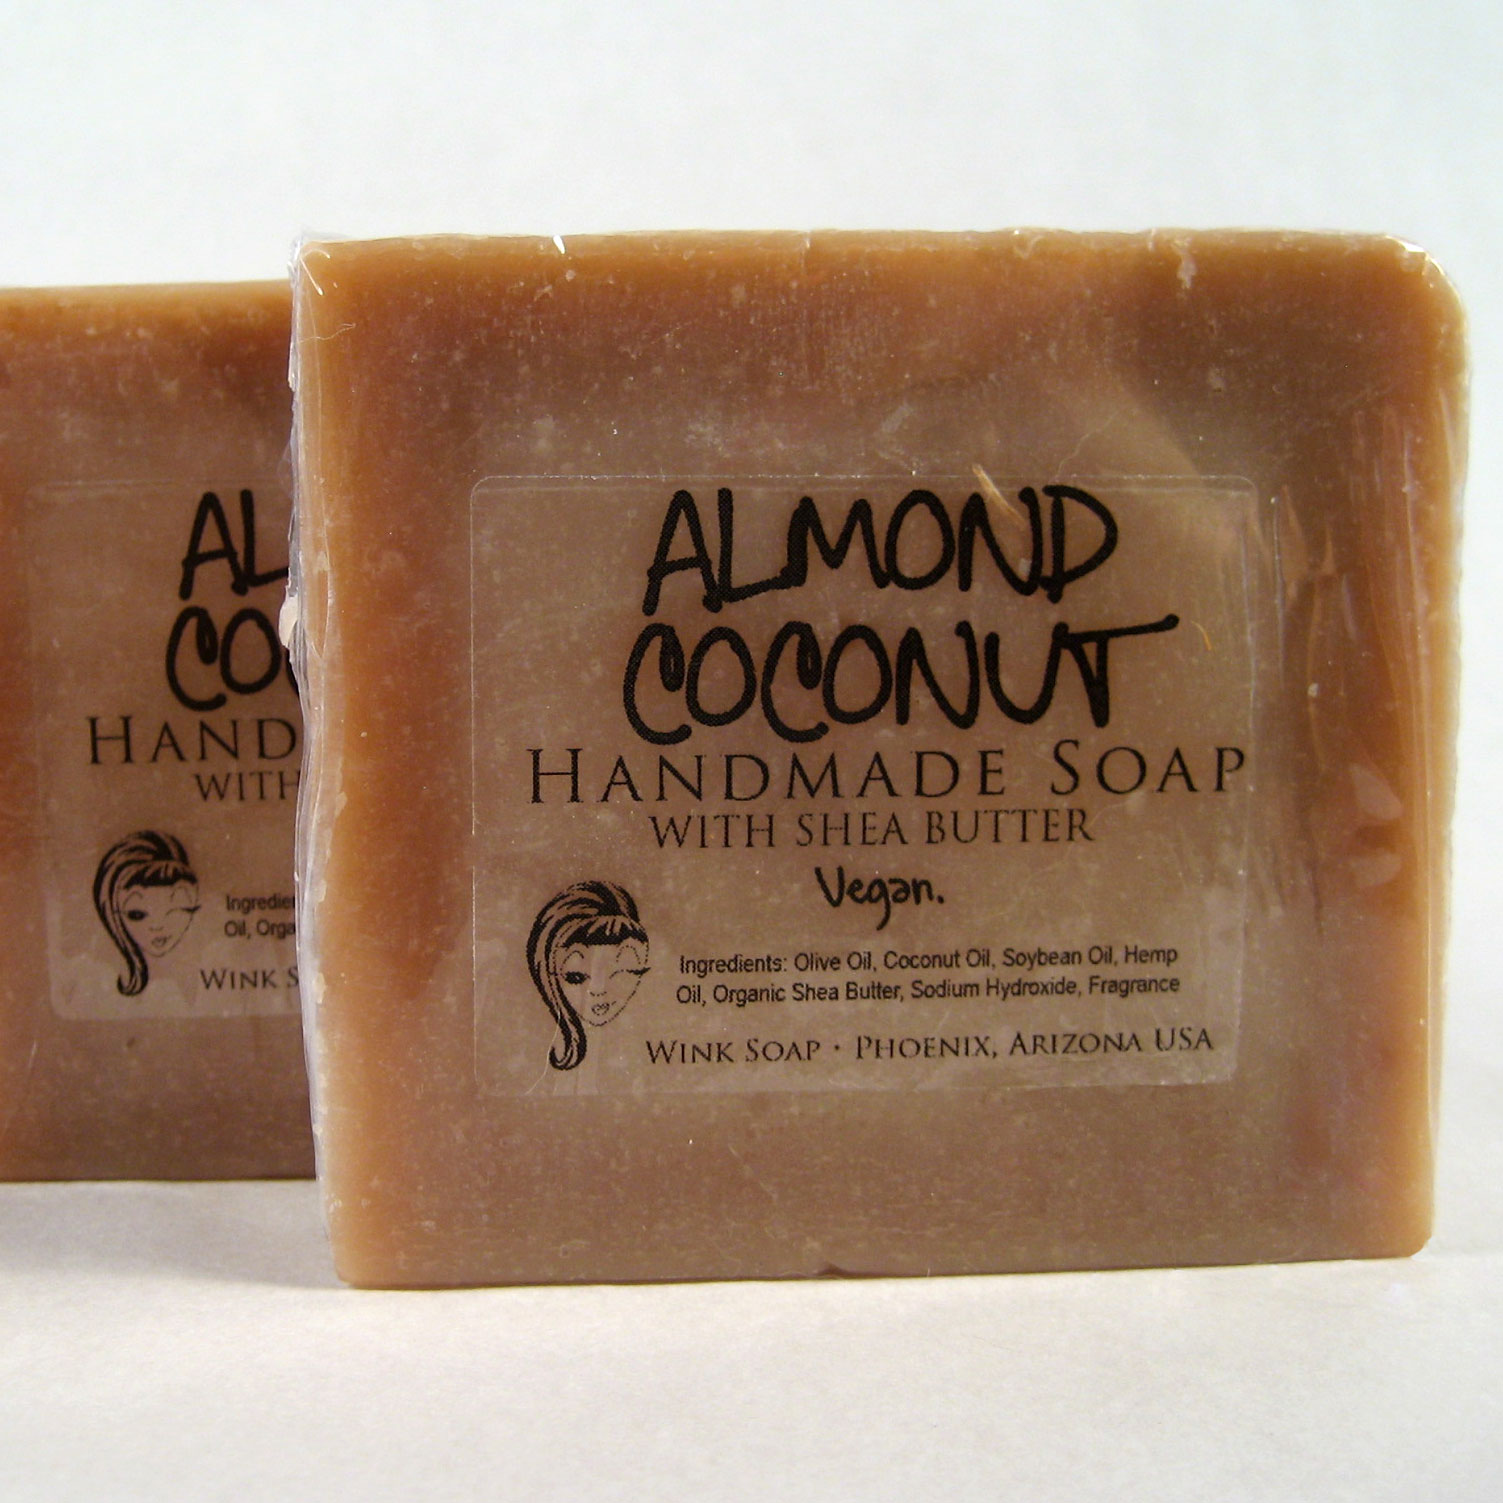 Win a Free Almond Coconut Handmade Soap Bar